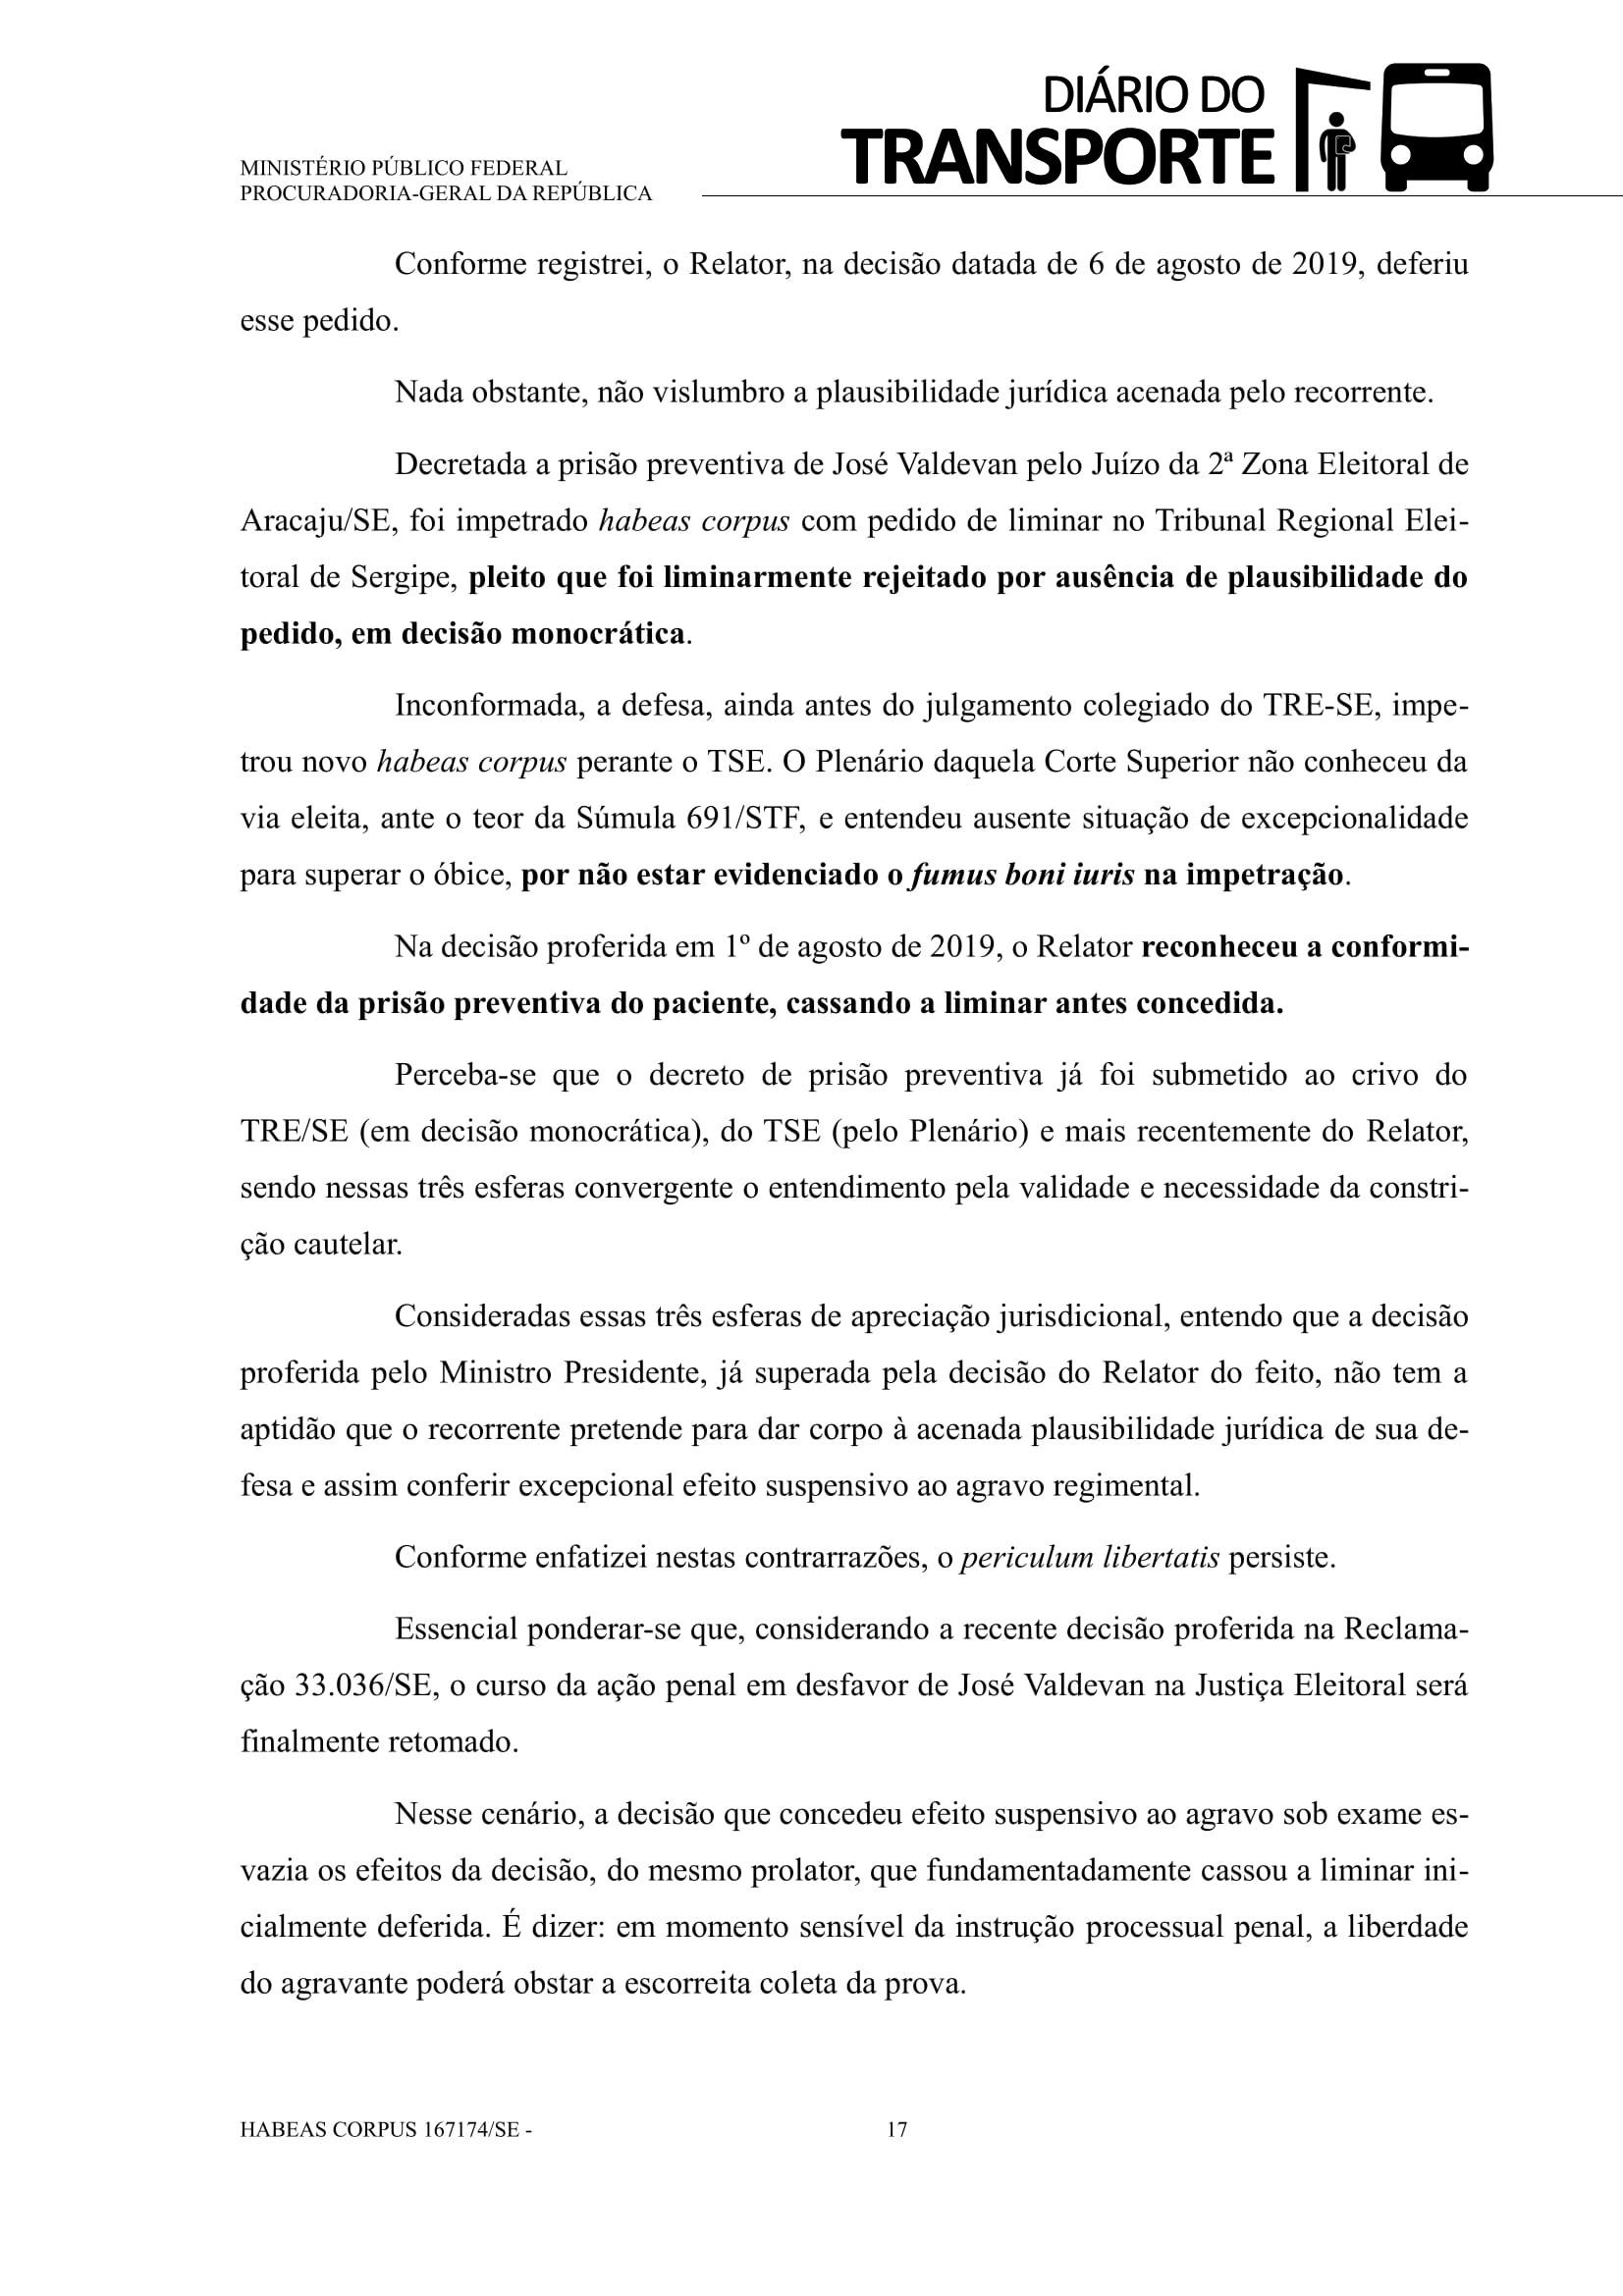 HC 167174_ContrarrazoesAgravo_Jose Valdevan de Jesus Santos-17